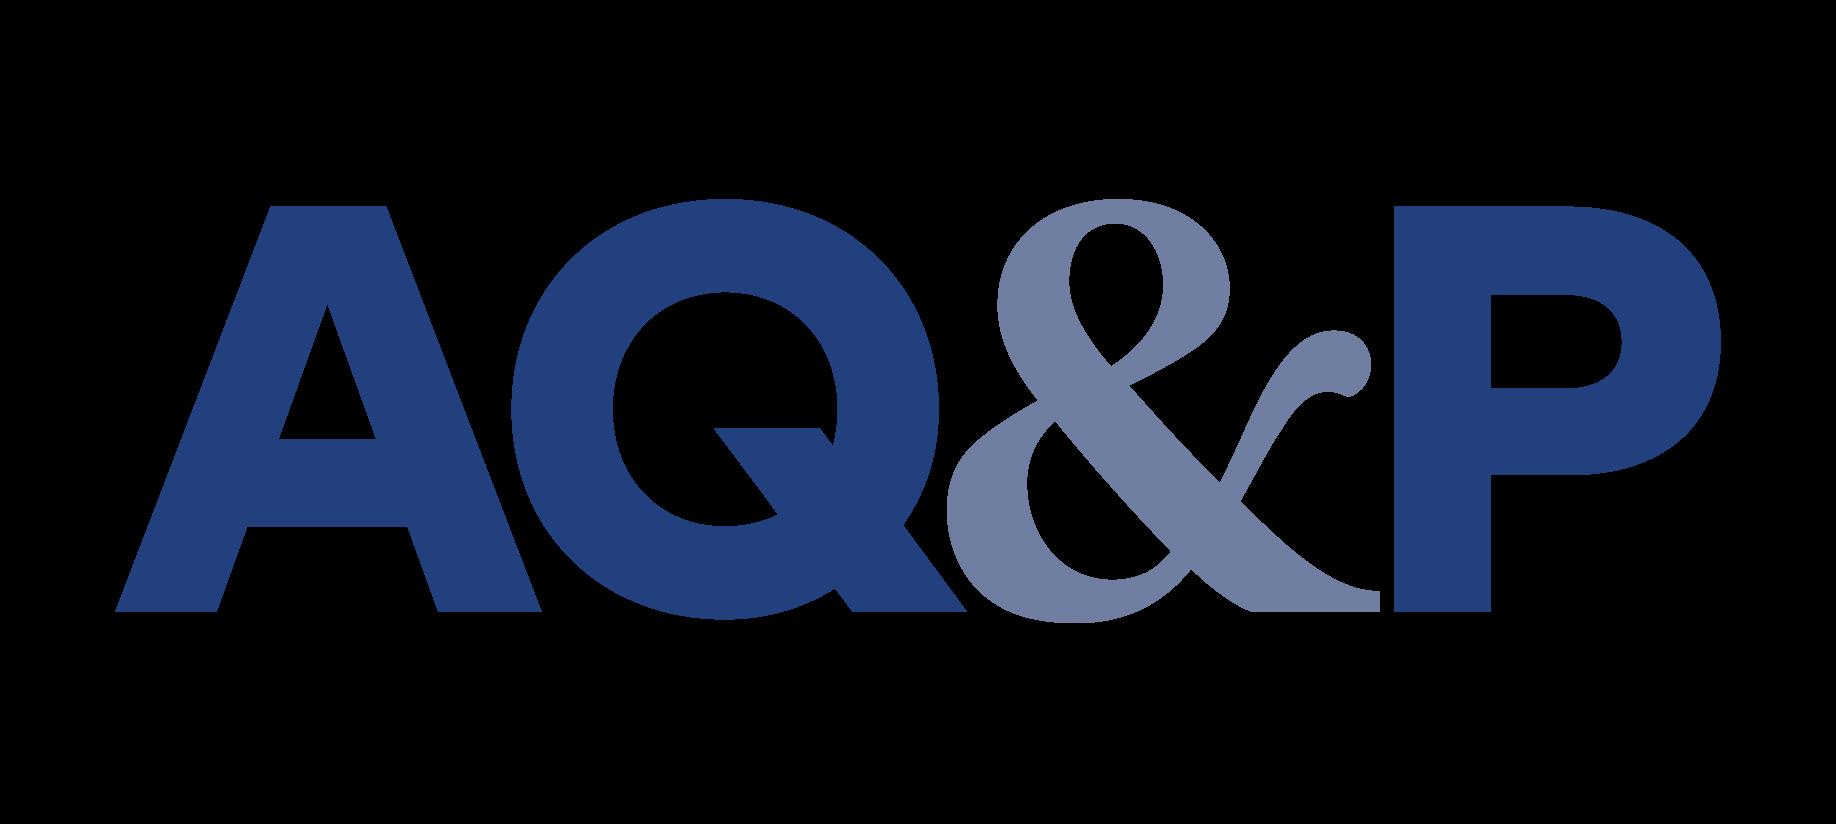 AQP003_Logo Design Final Logo-01 Cropped.png